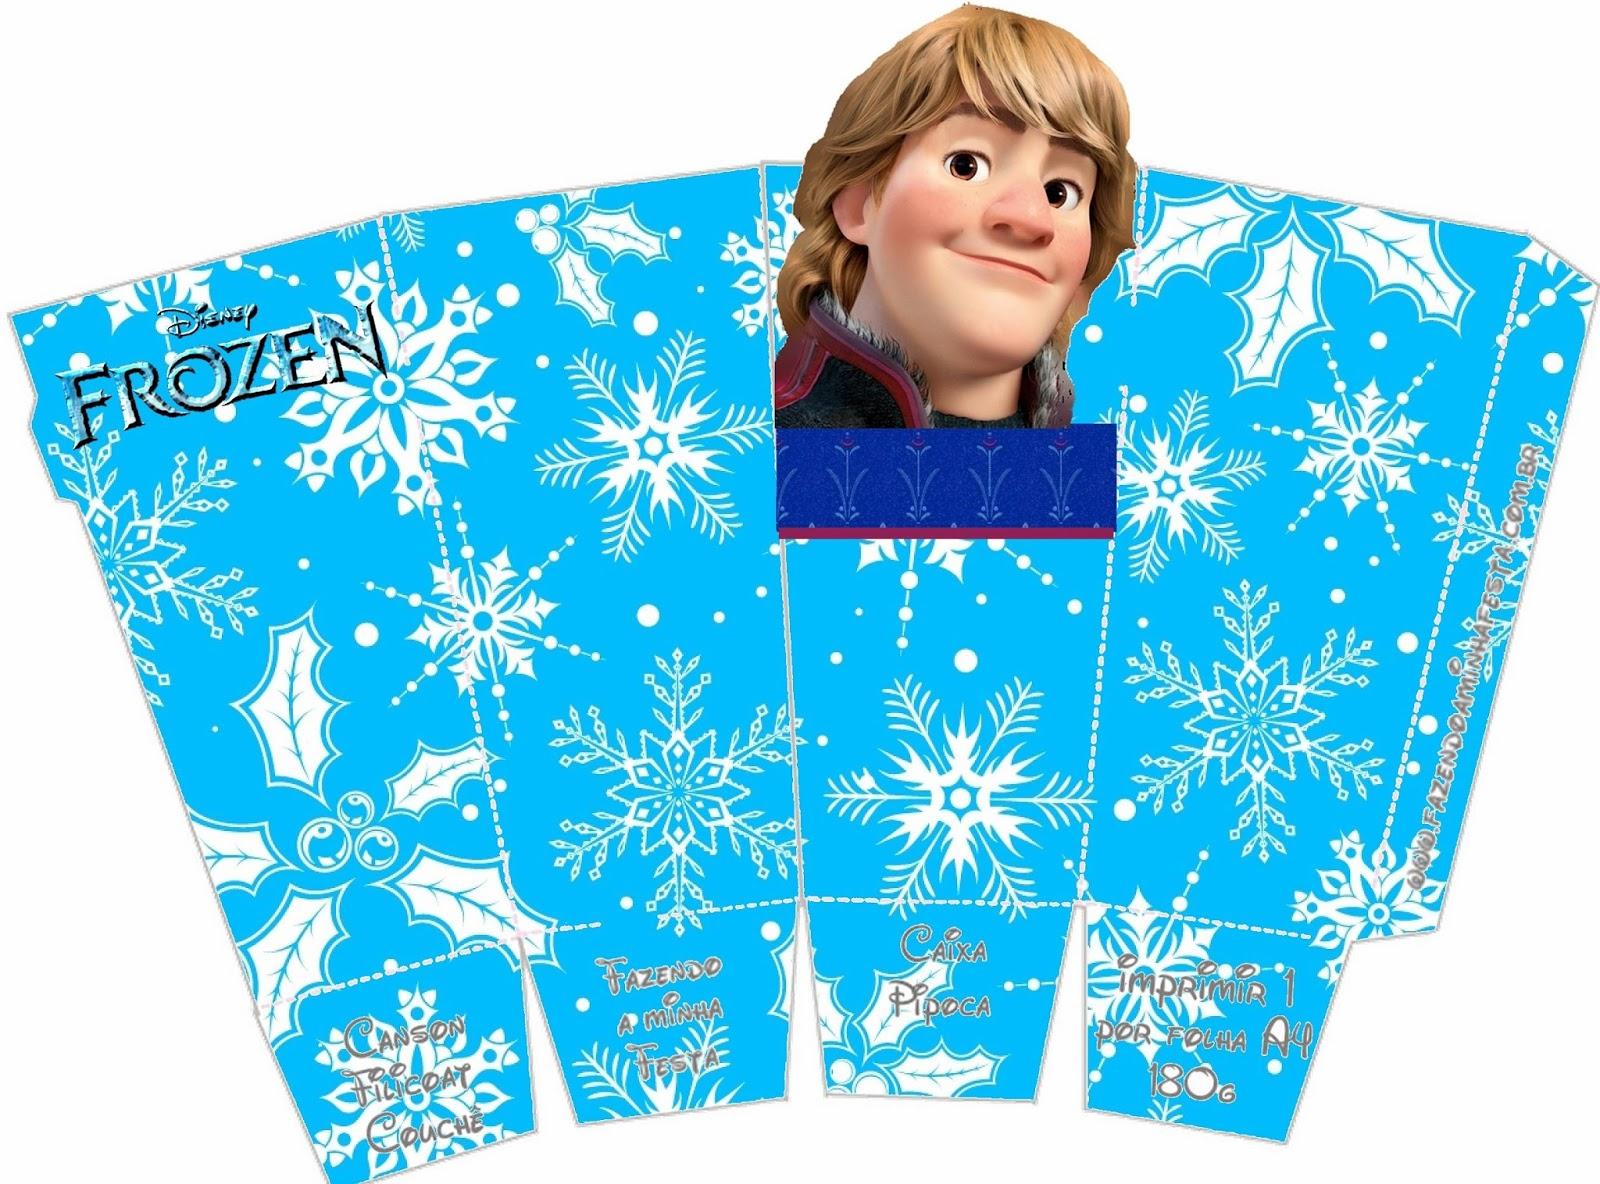 Frozen: Caja de Kristoff para Popcorn, para Imprimir Gratis.